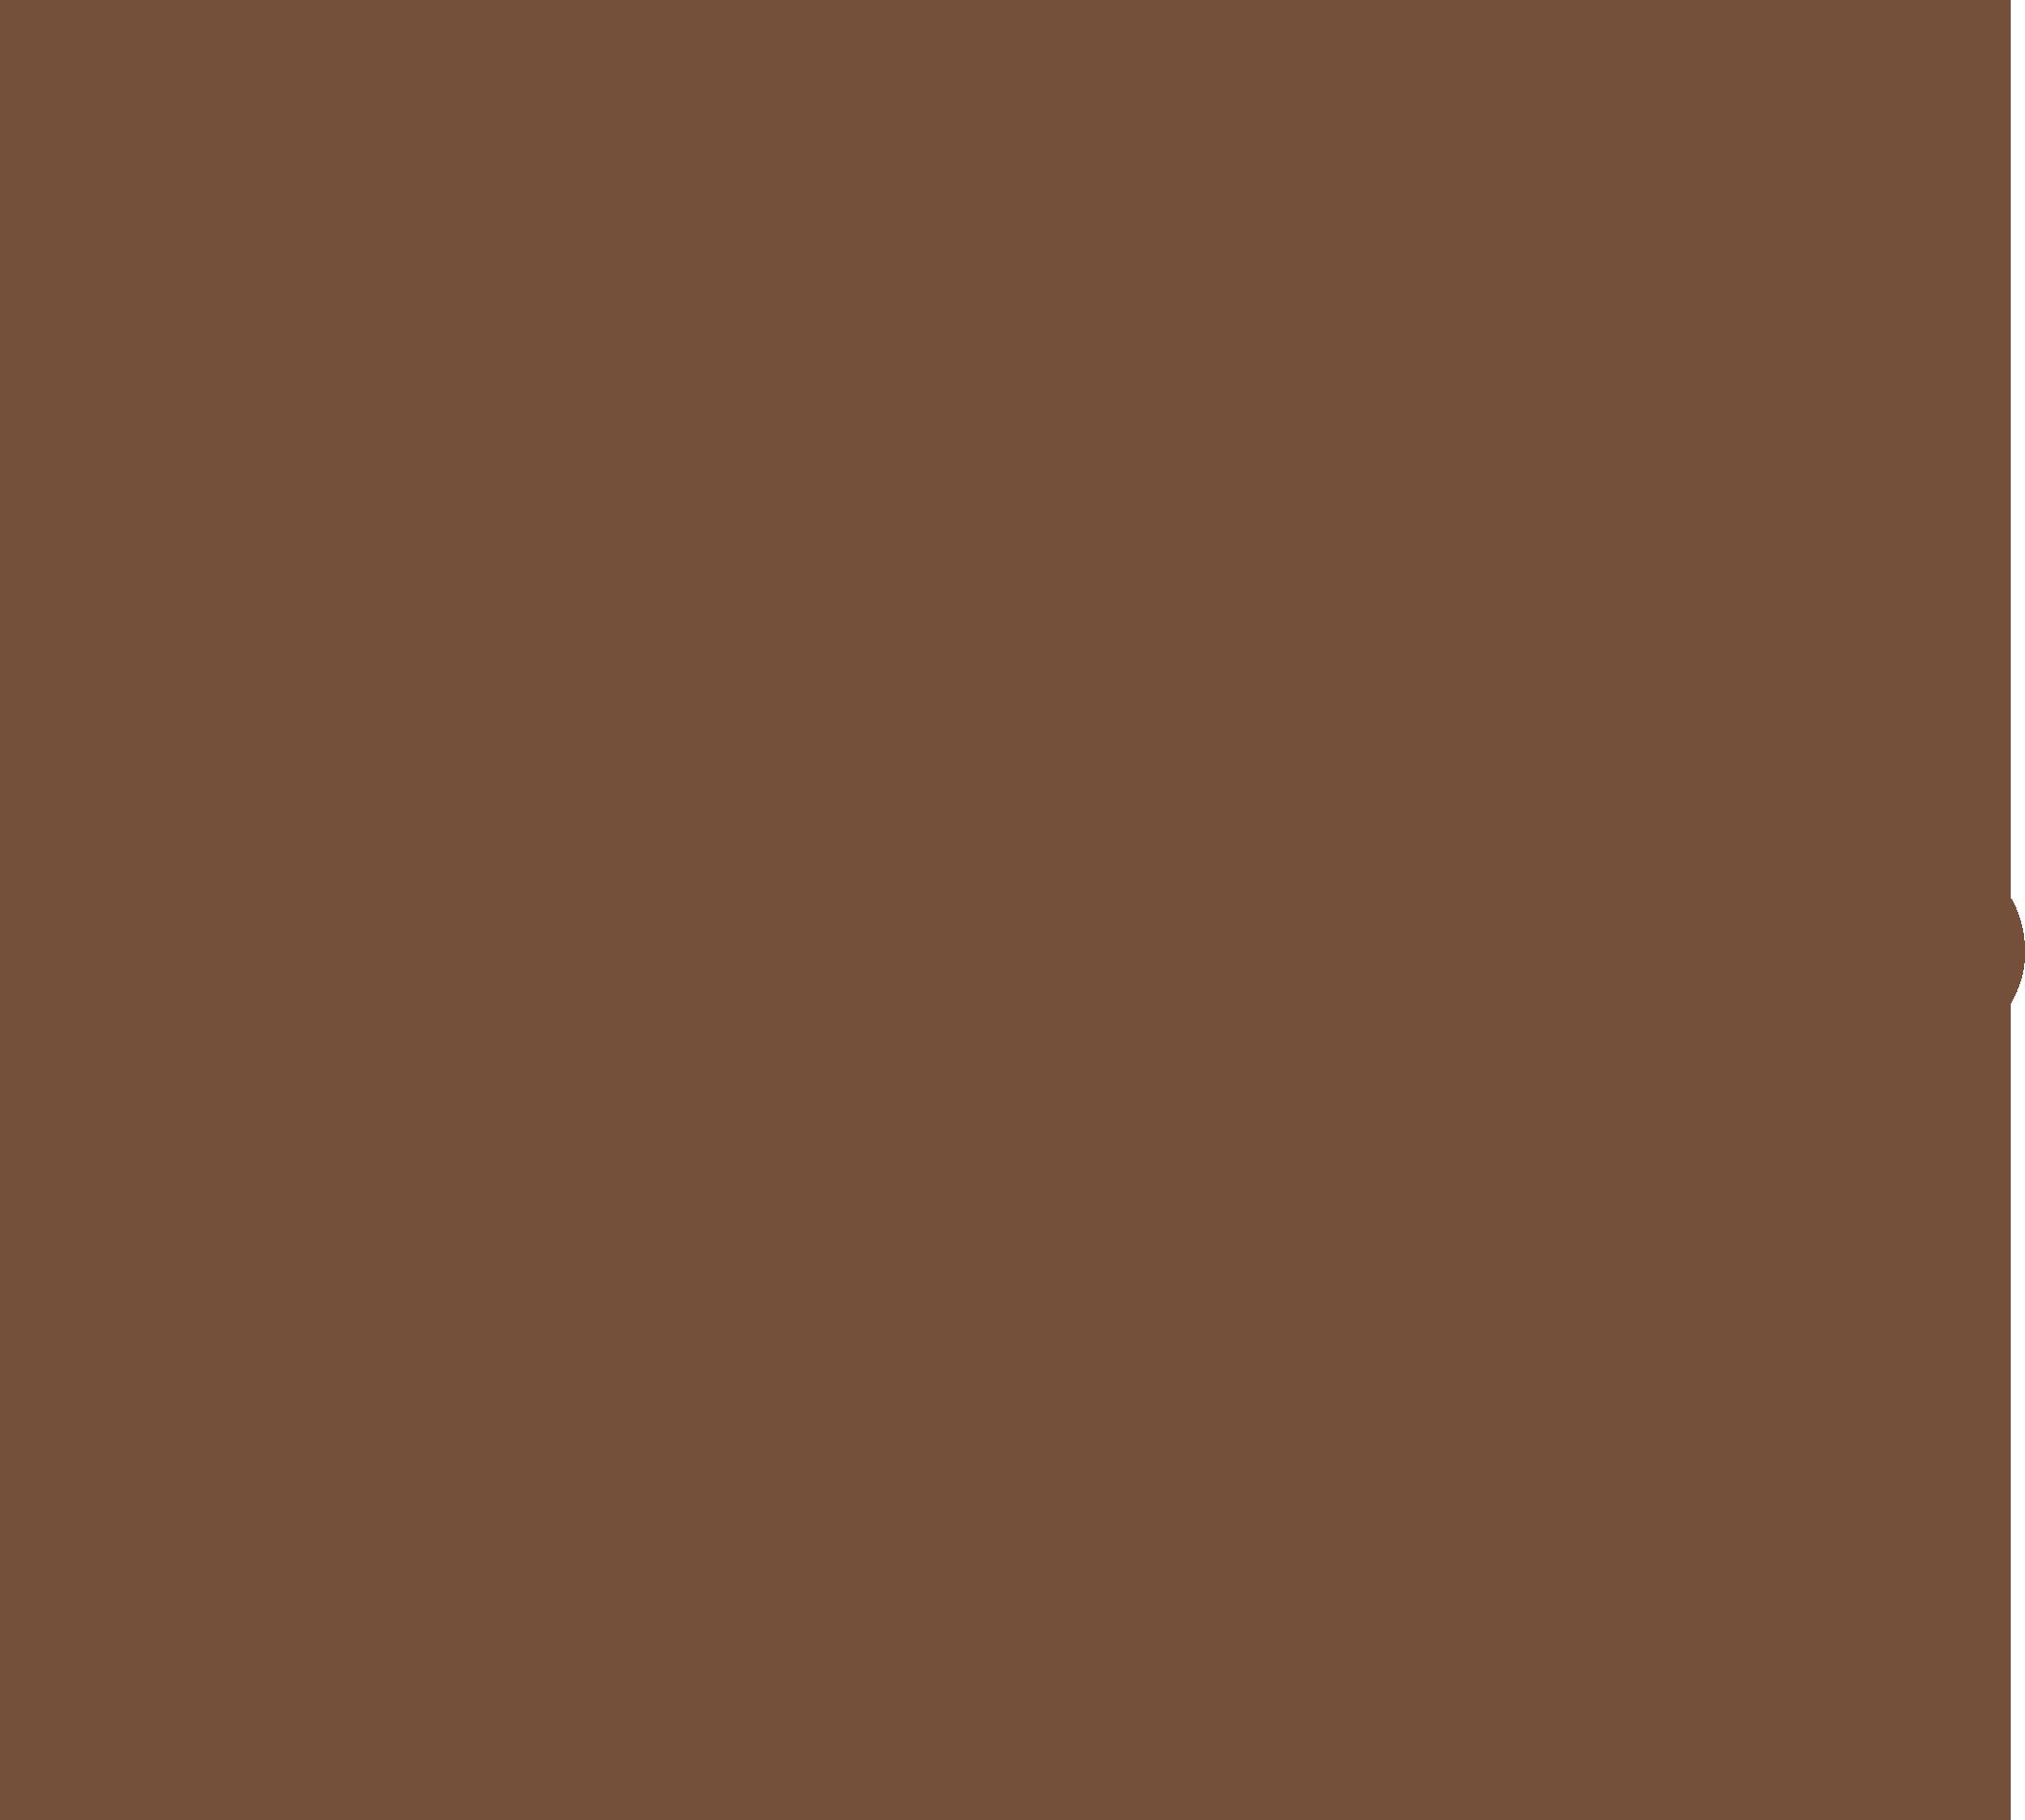 PaPrezzo - Pantofi eleganti | Pantofi casual | Accesorii din piele naturala